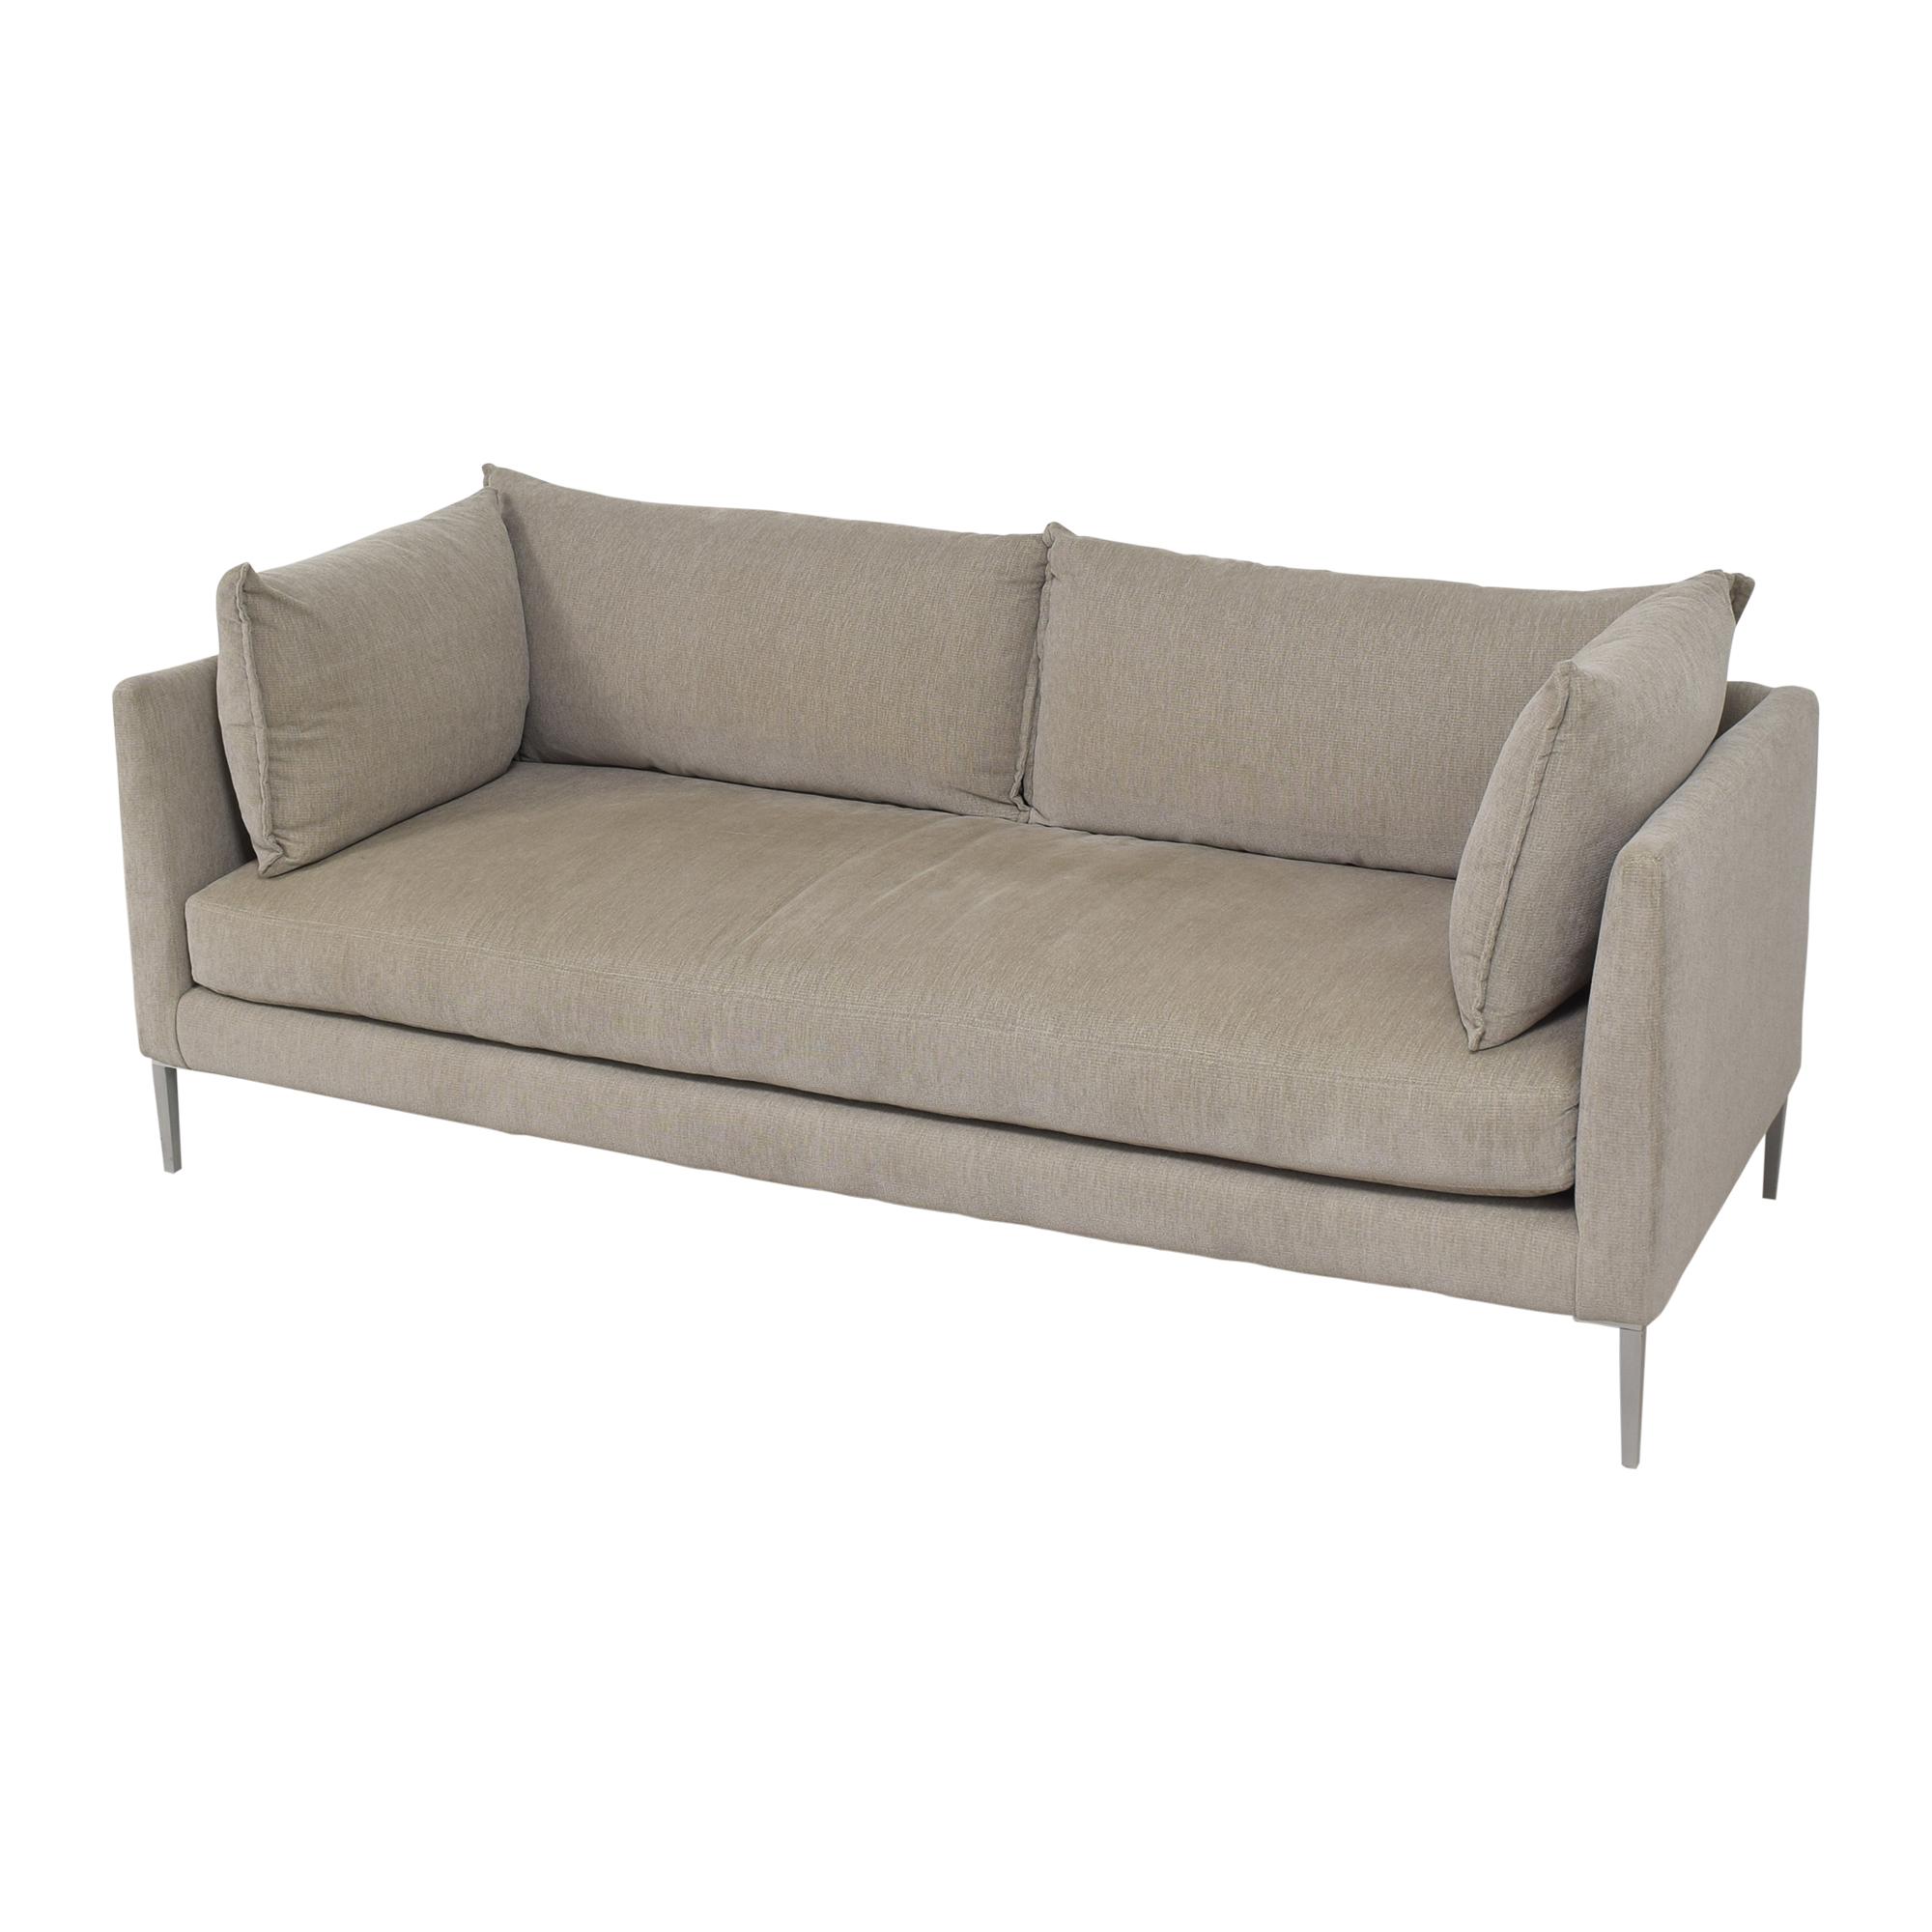 Room & Board Room & Board Vela Sofa for sale